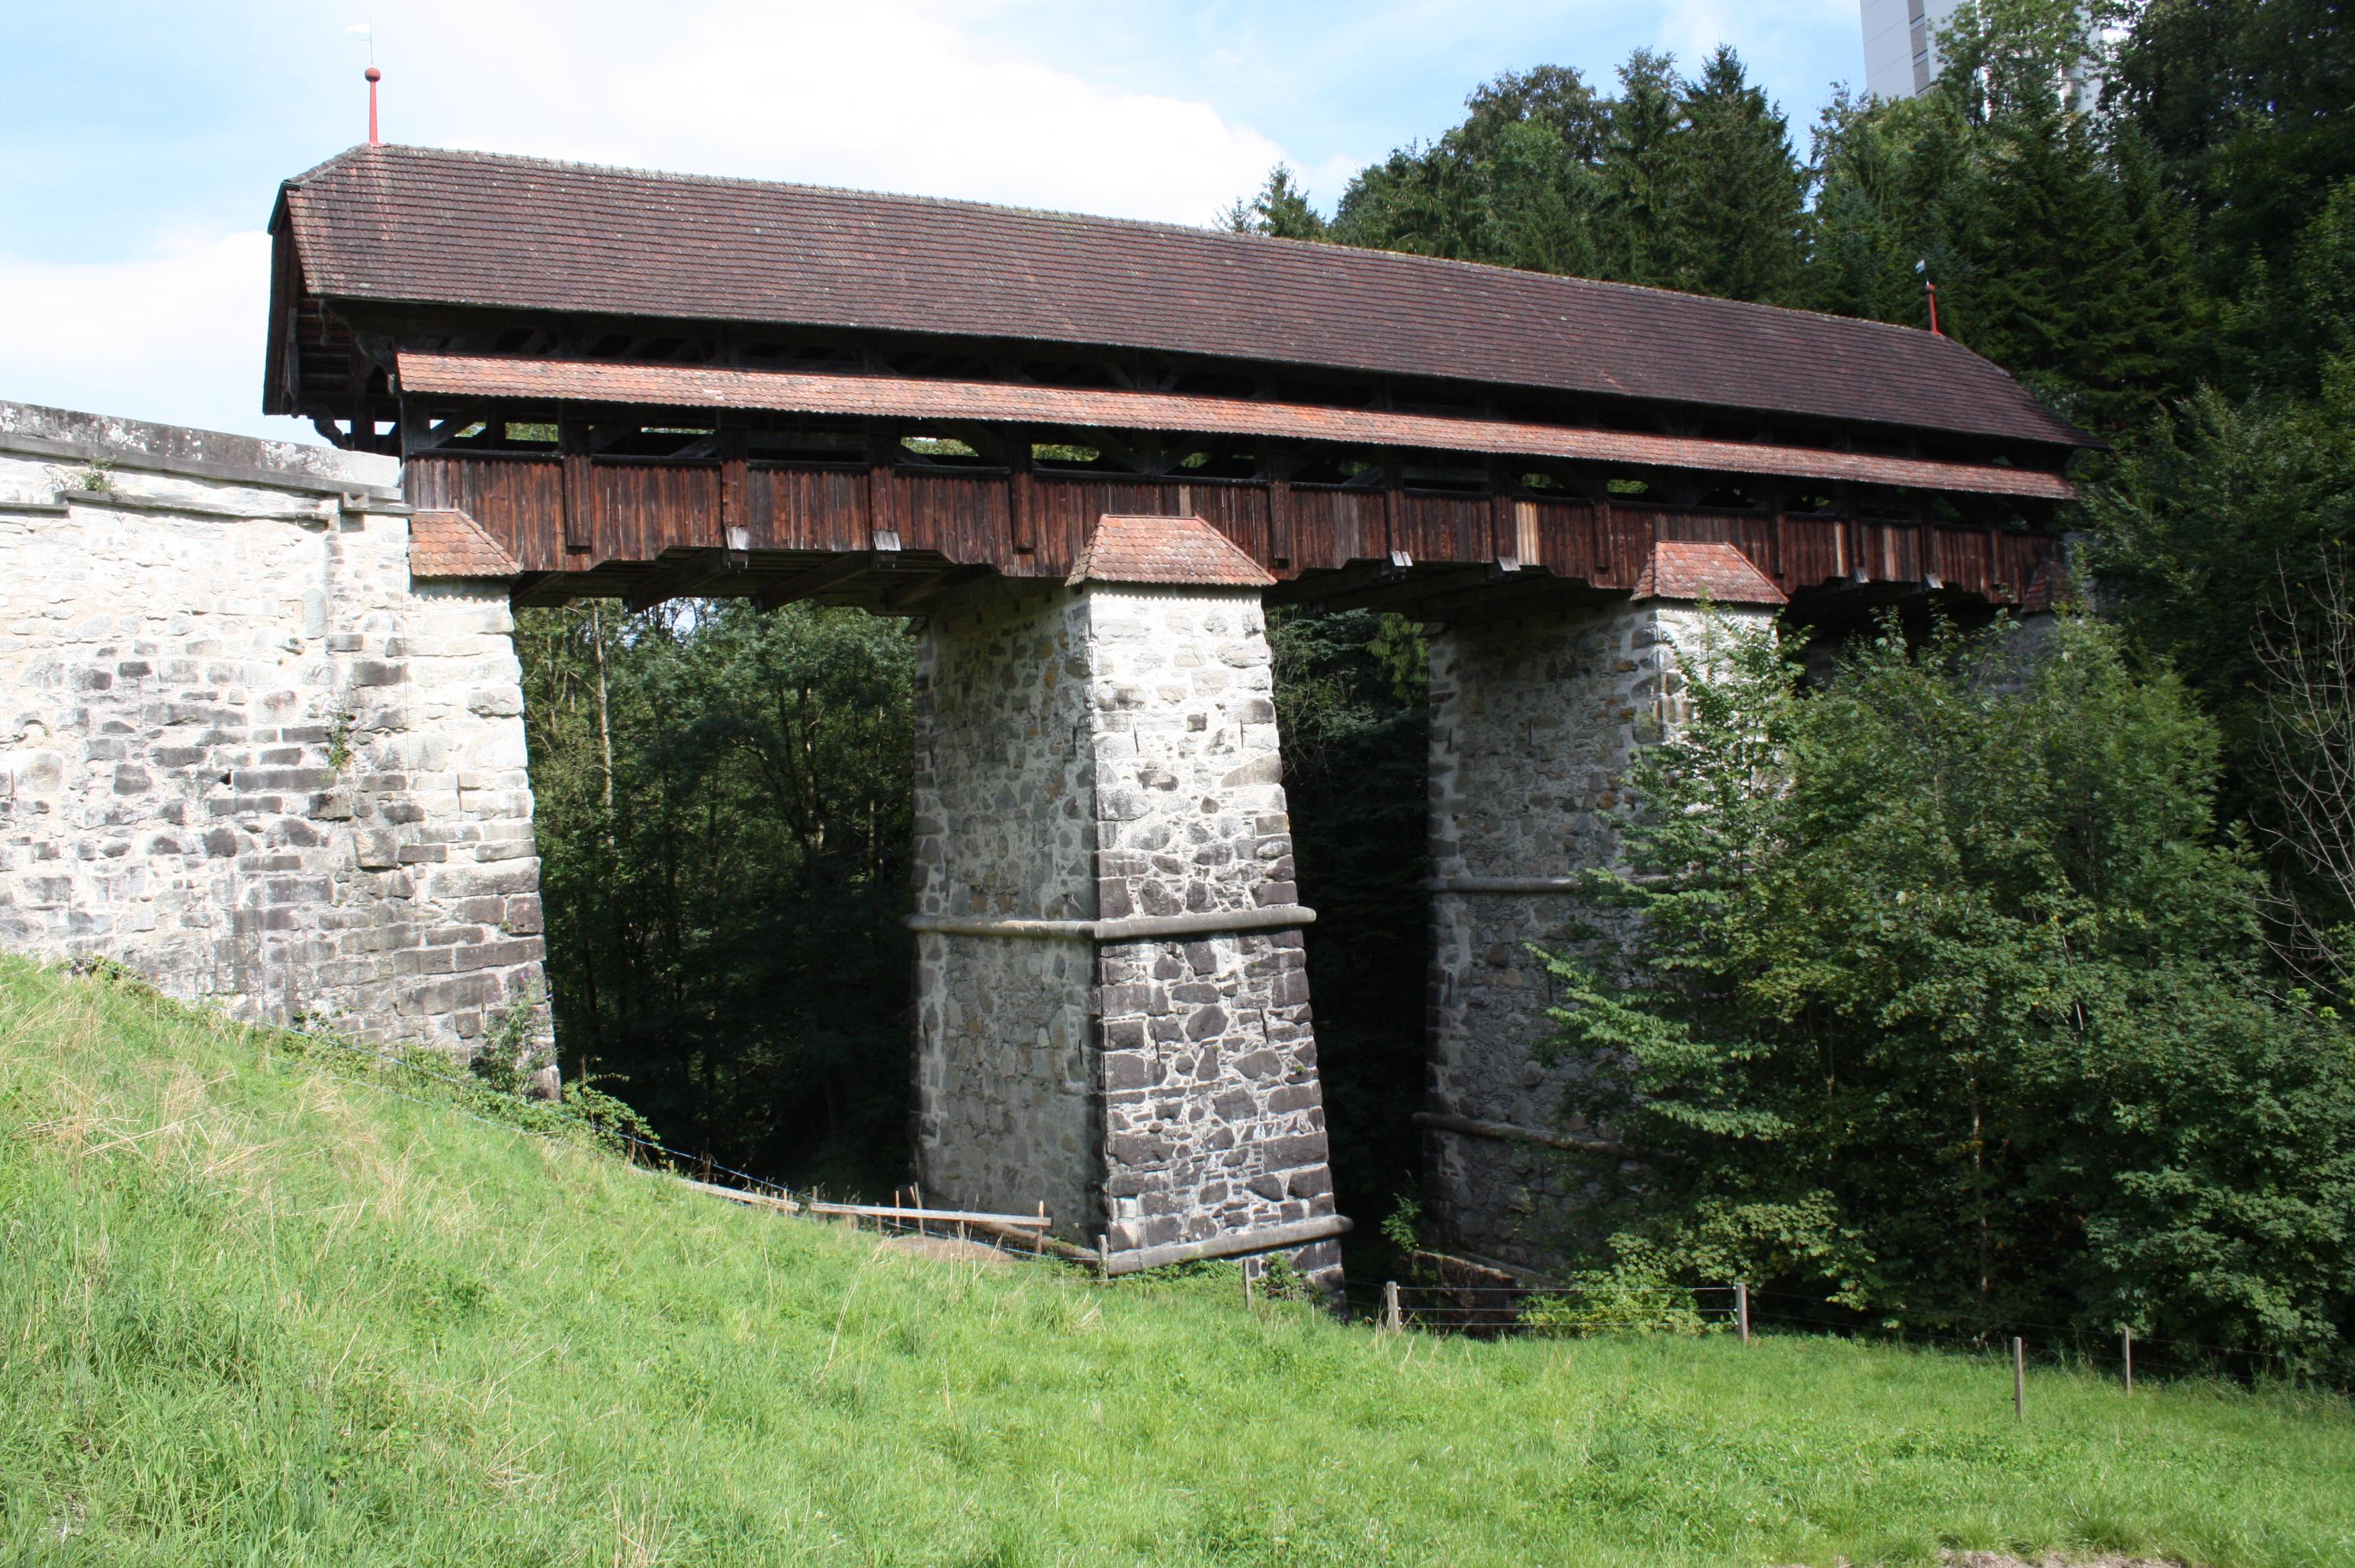 Datei:Alte Brücke Rothenburg IMG 4414.jpg – Wikipedia